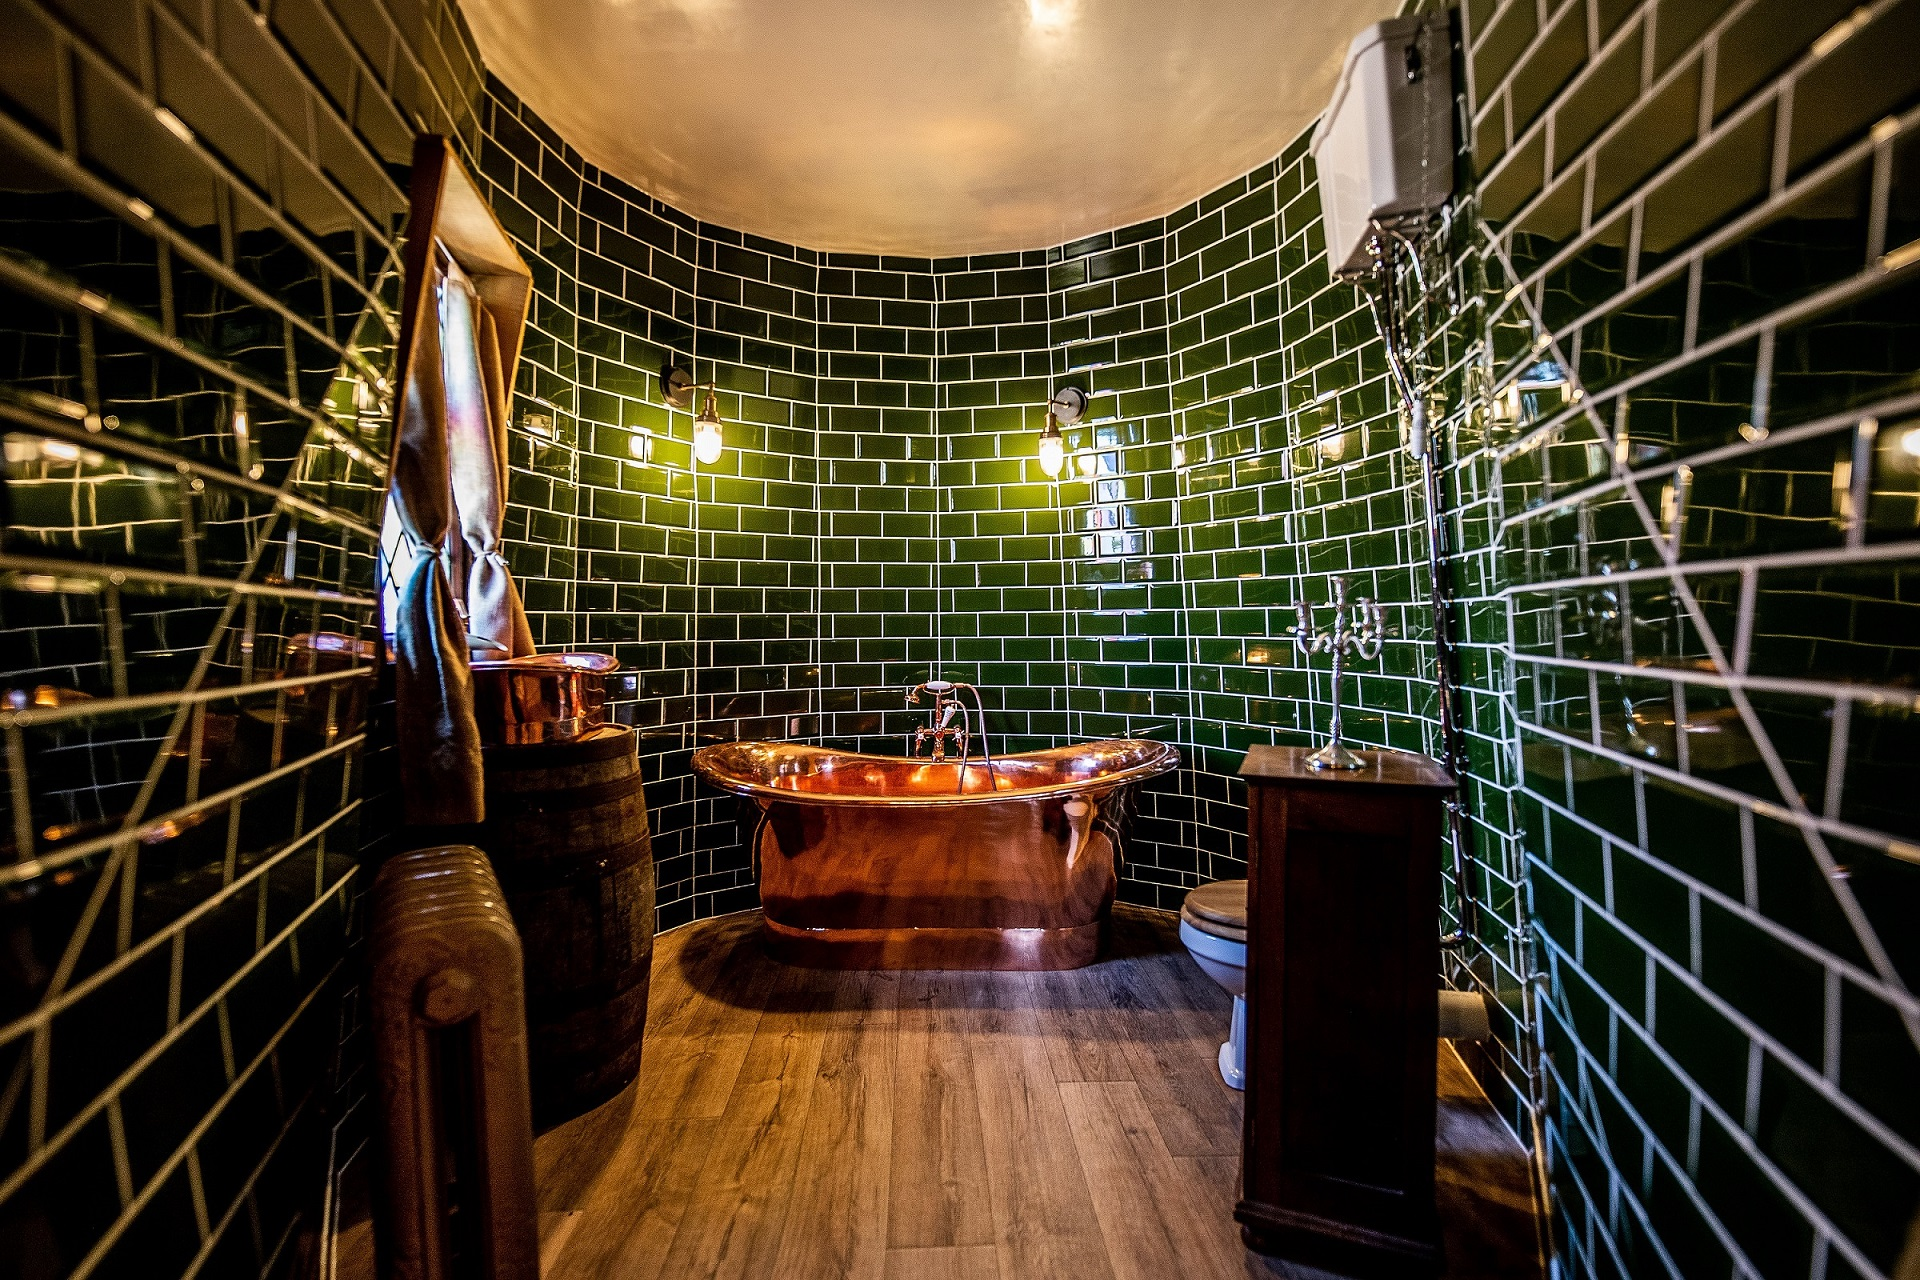 The decor backs up the Harry Potter theme. Credit: Charlotte Graham